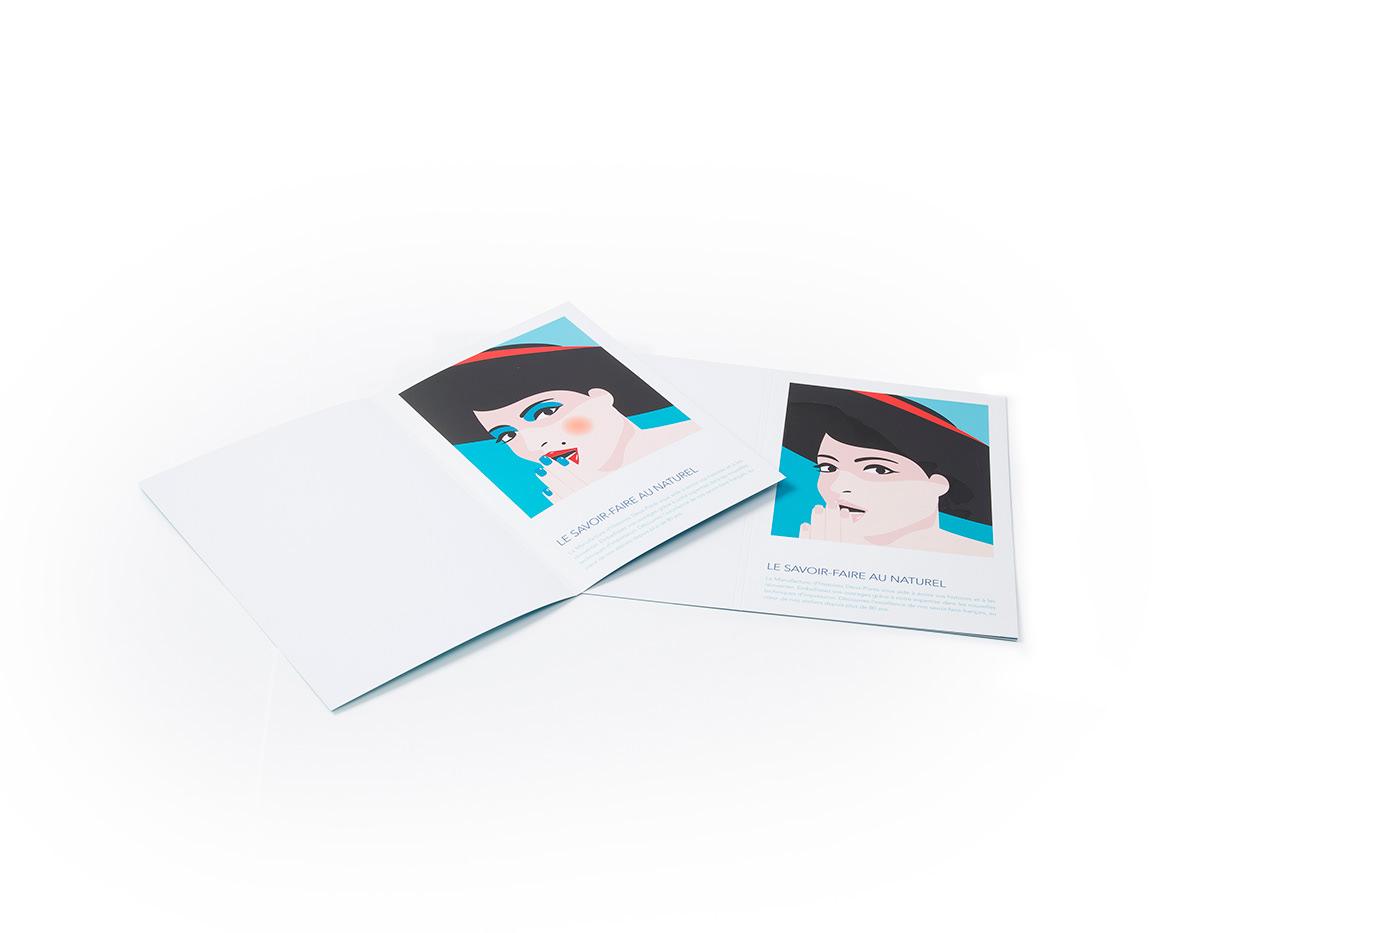 impression Encre Effet visuel print surprise Magic   ink innovation creation imprimerie